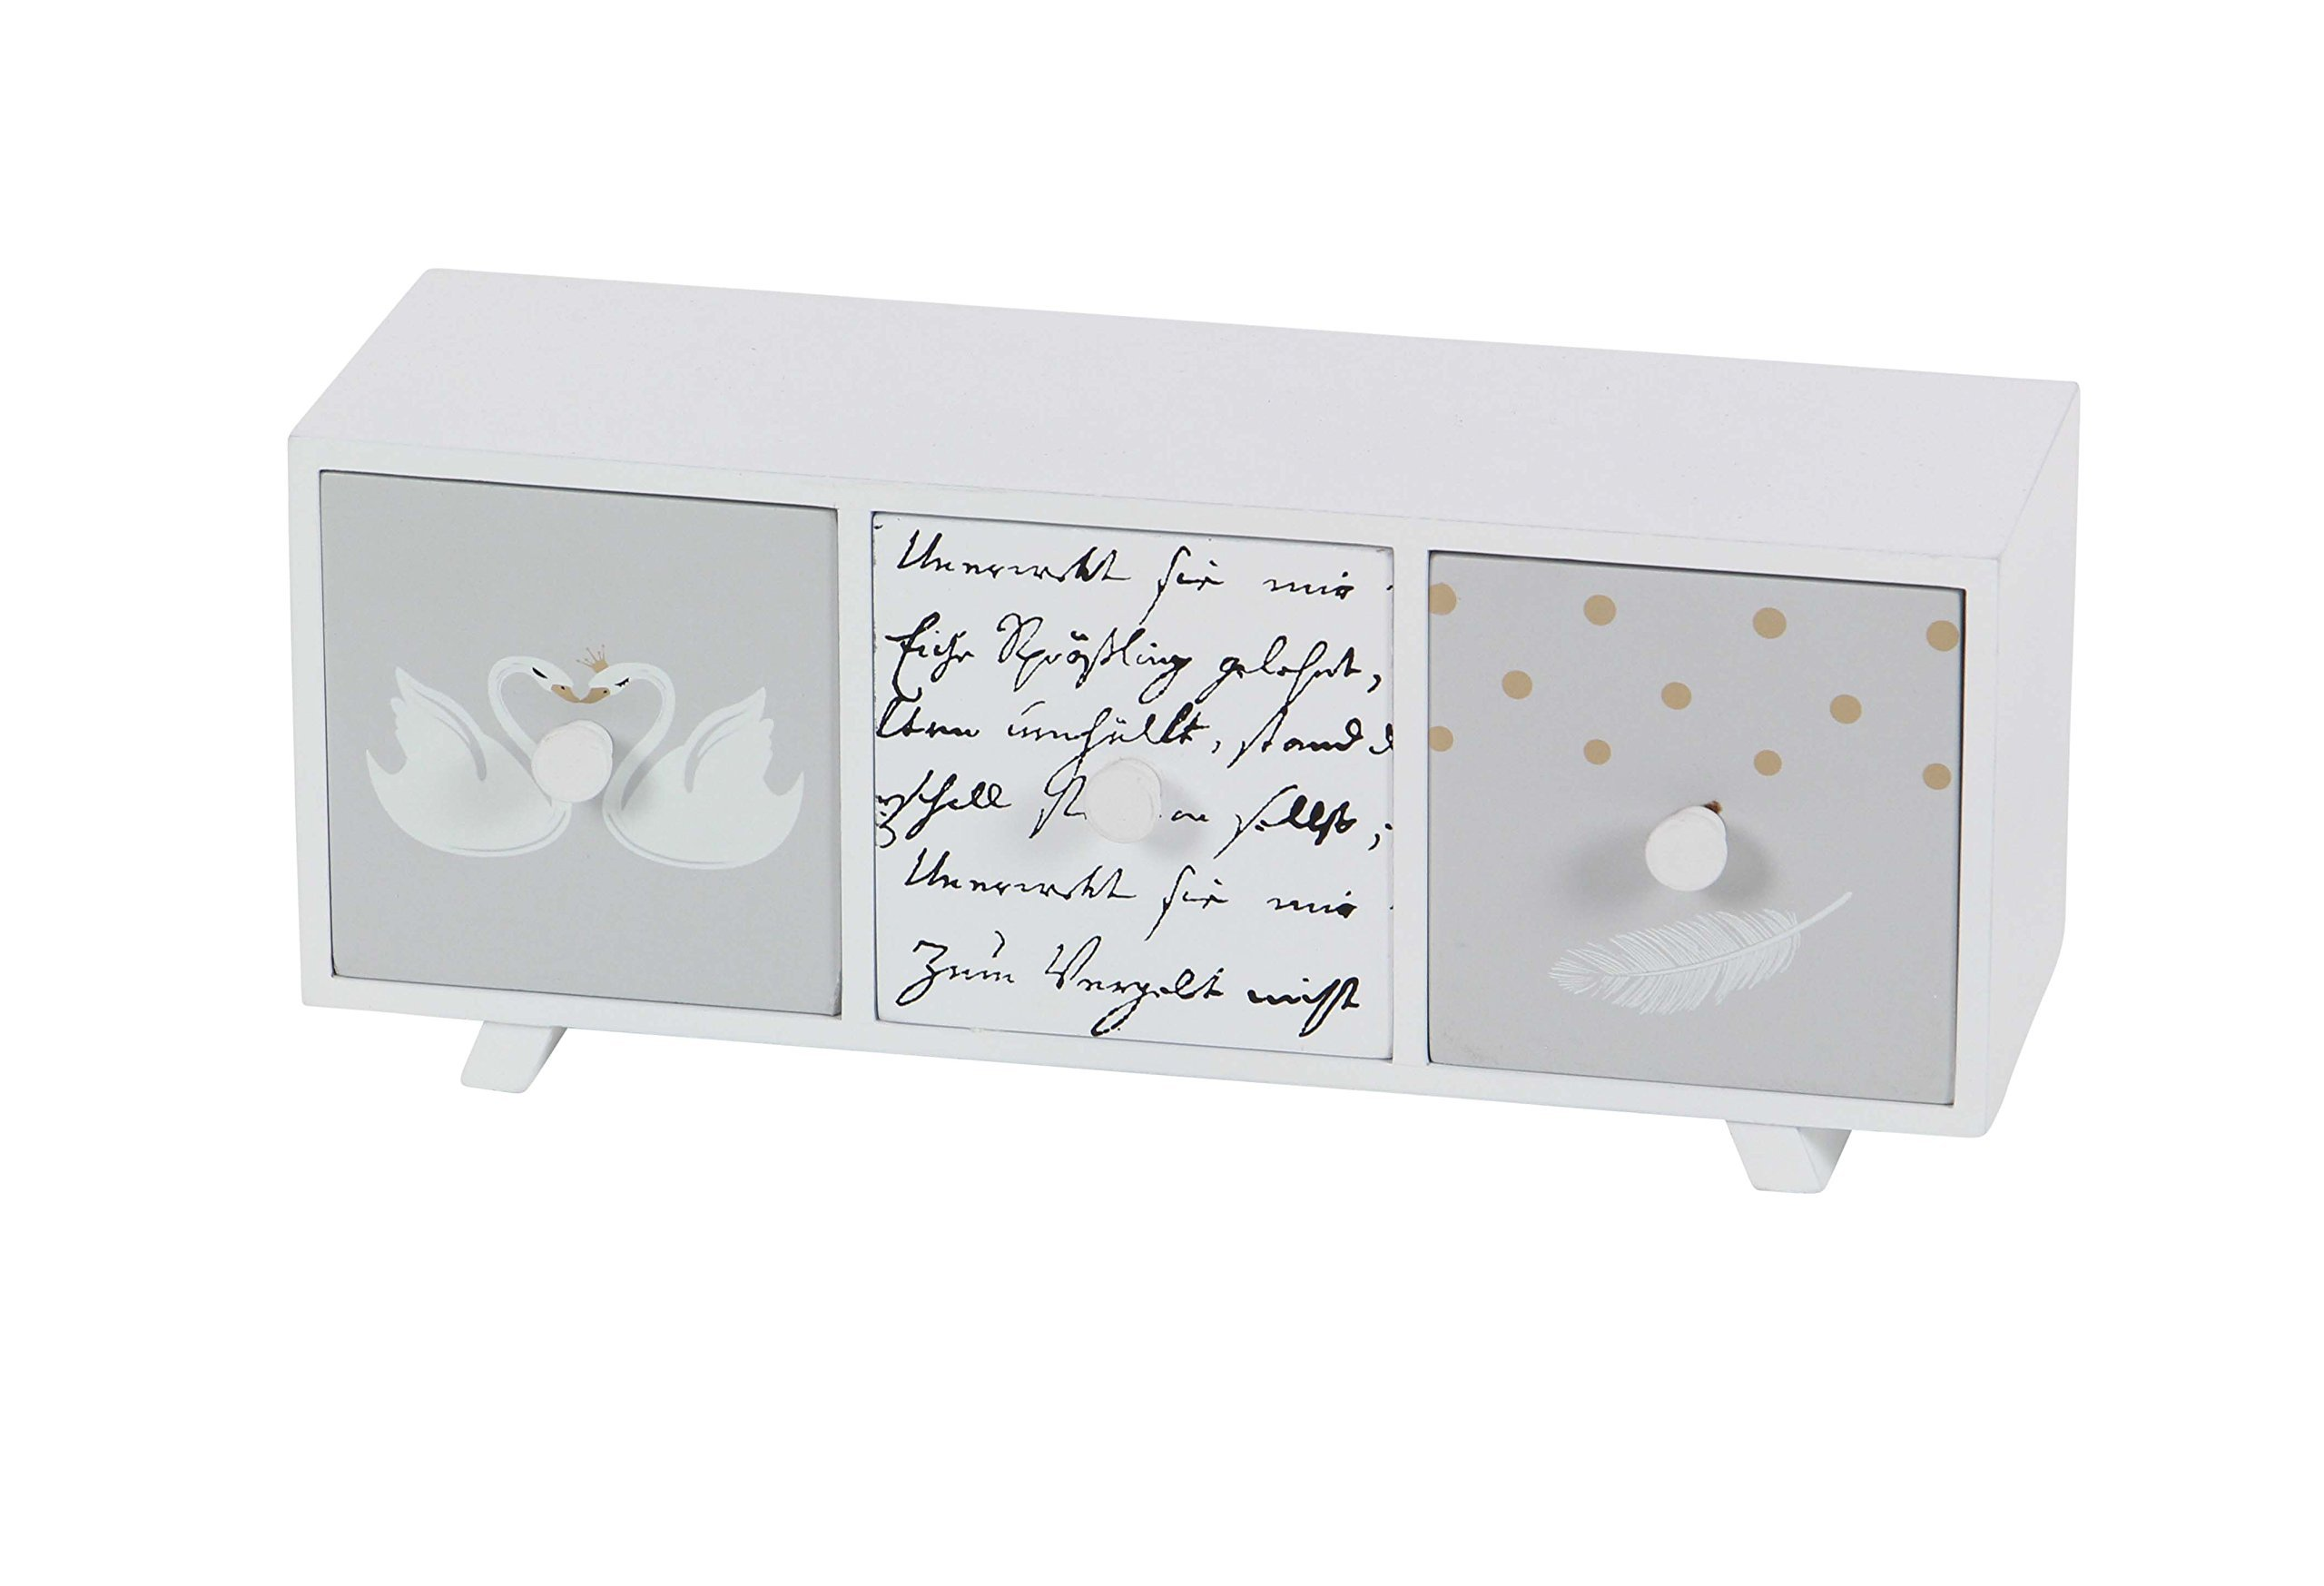 Deco 79 98769 White Three-Drawer Wooden Jewelry Chest, 5'' x 12'', White/Gray/Black